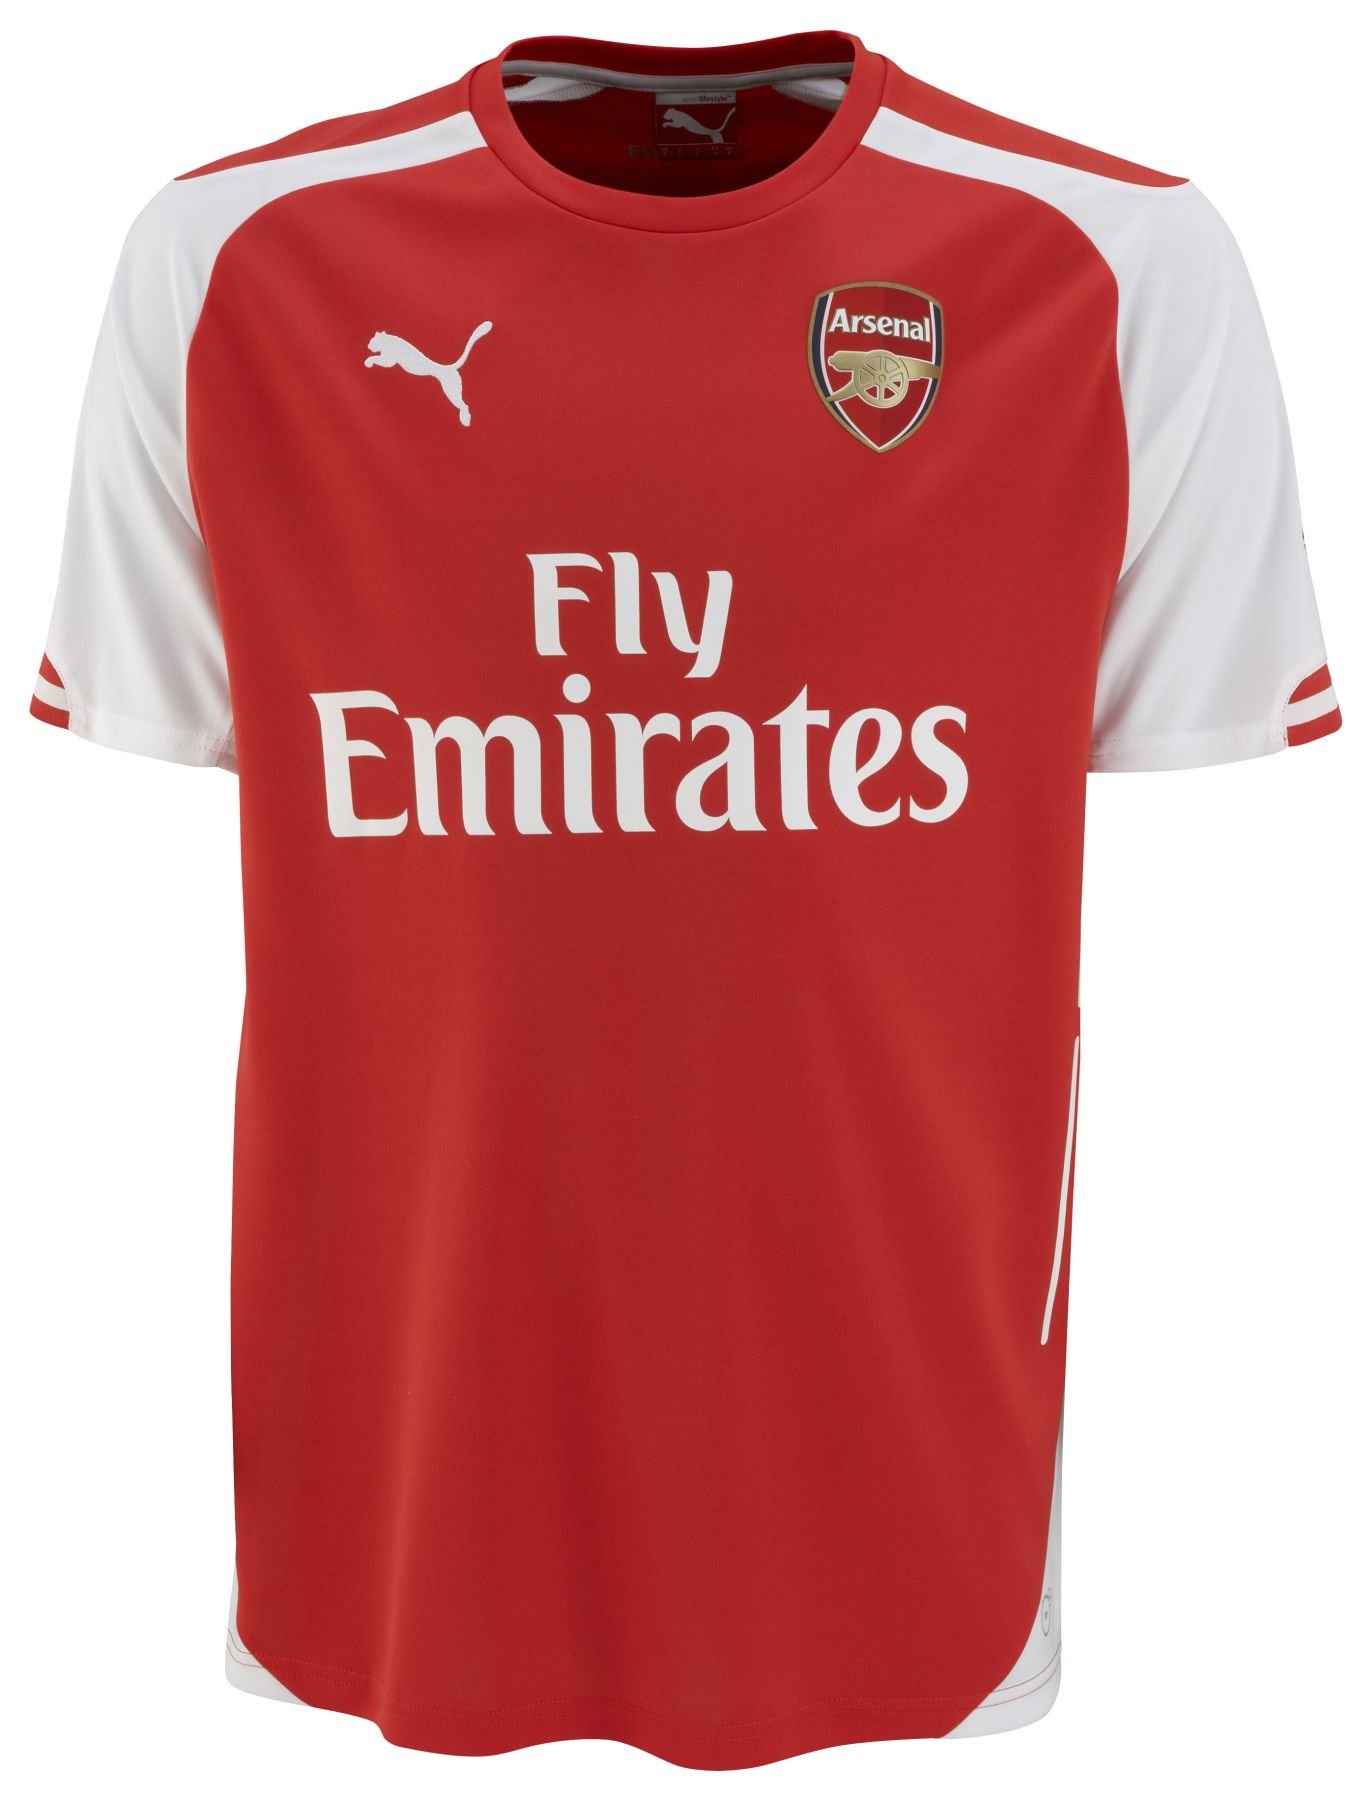 a72f0c2e14f Arsenal London Home Jersey 2014-15